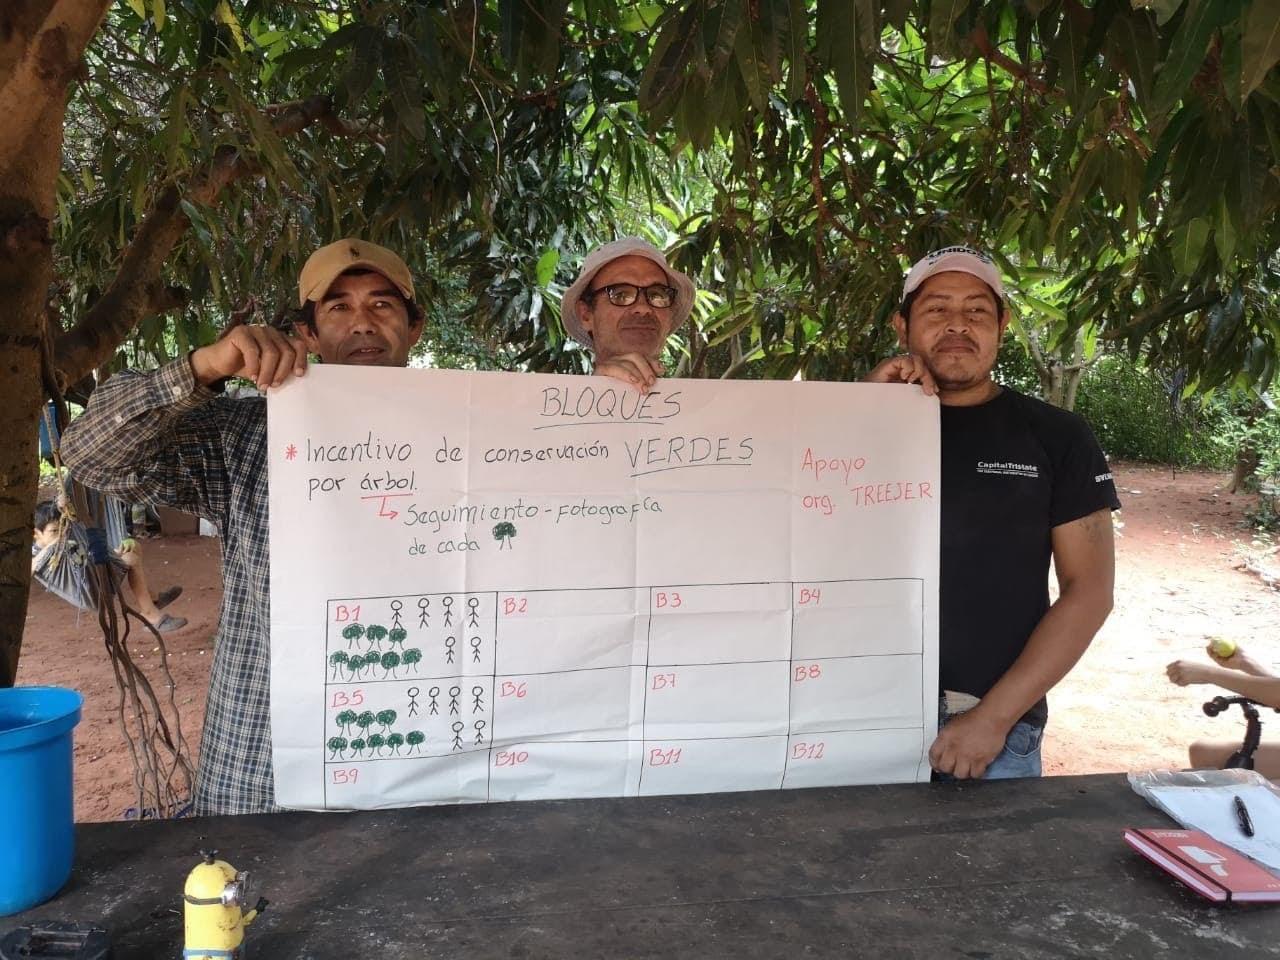 Treejer team